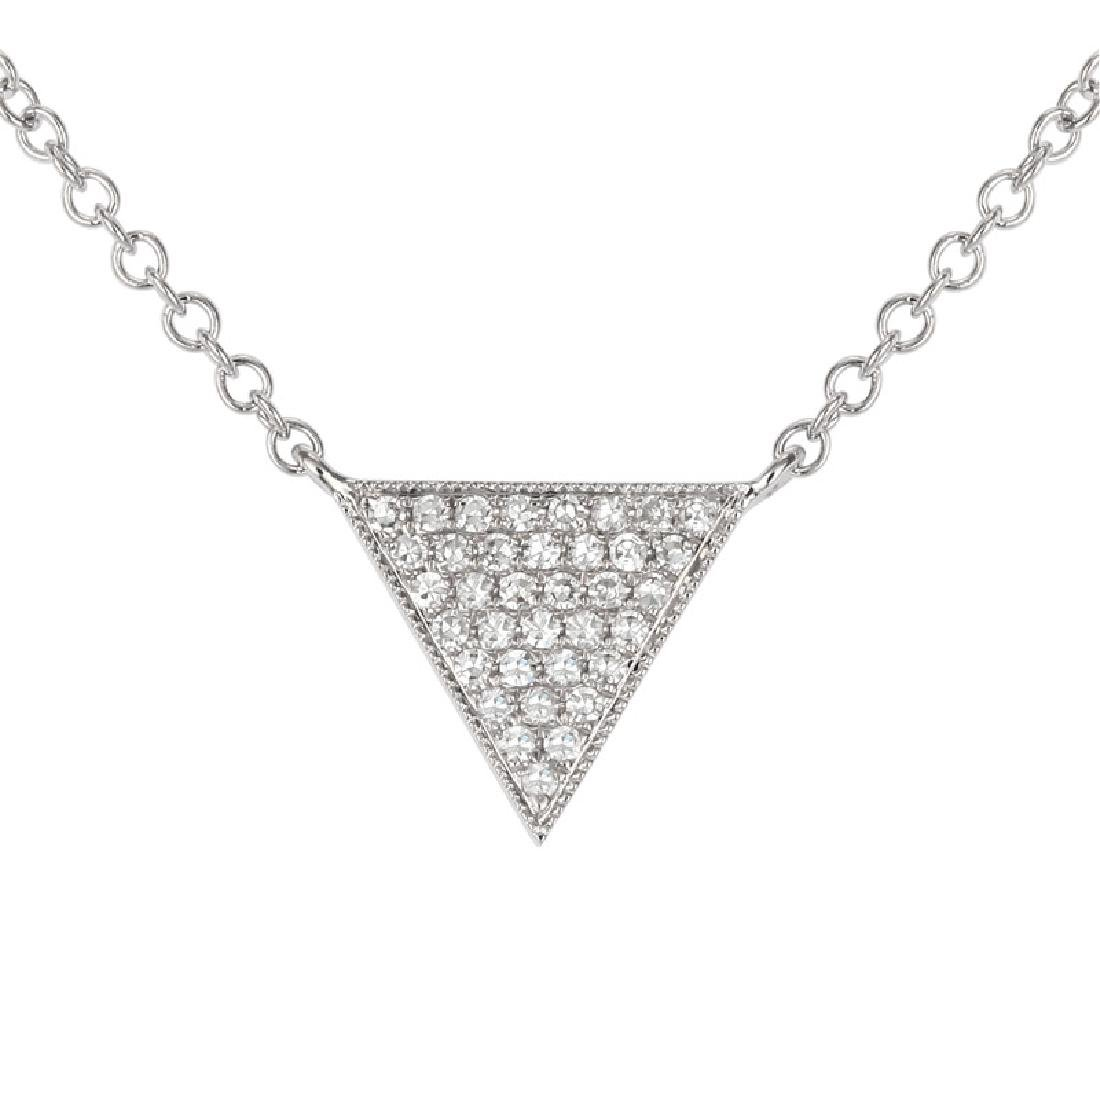 14KT White Gold Diamond Necklace